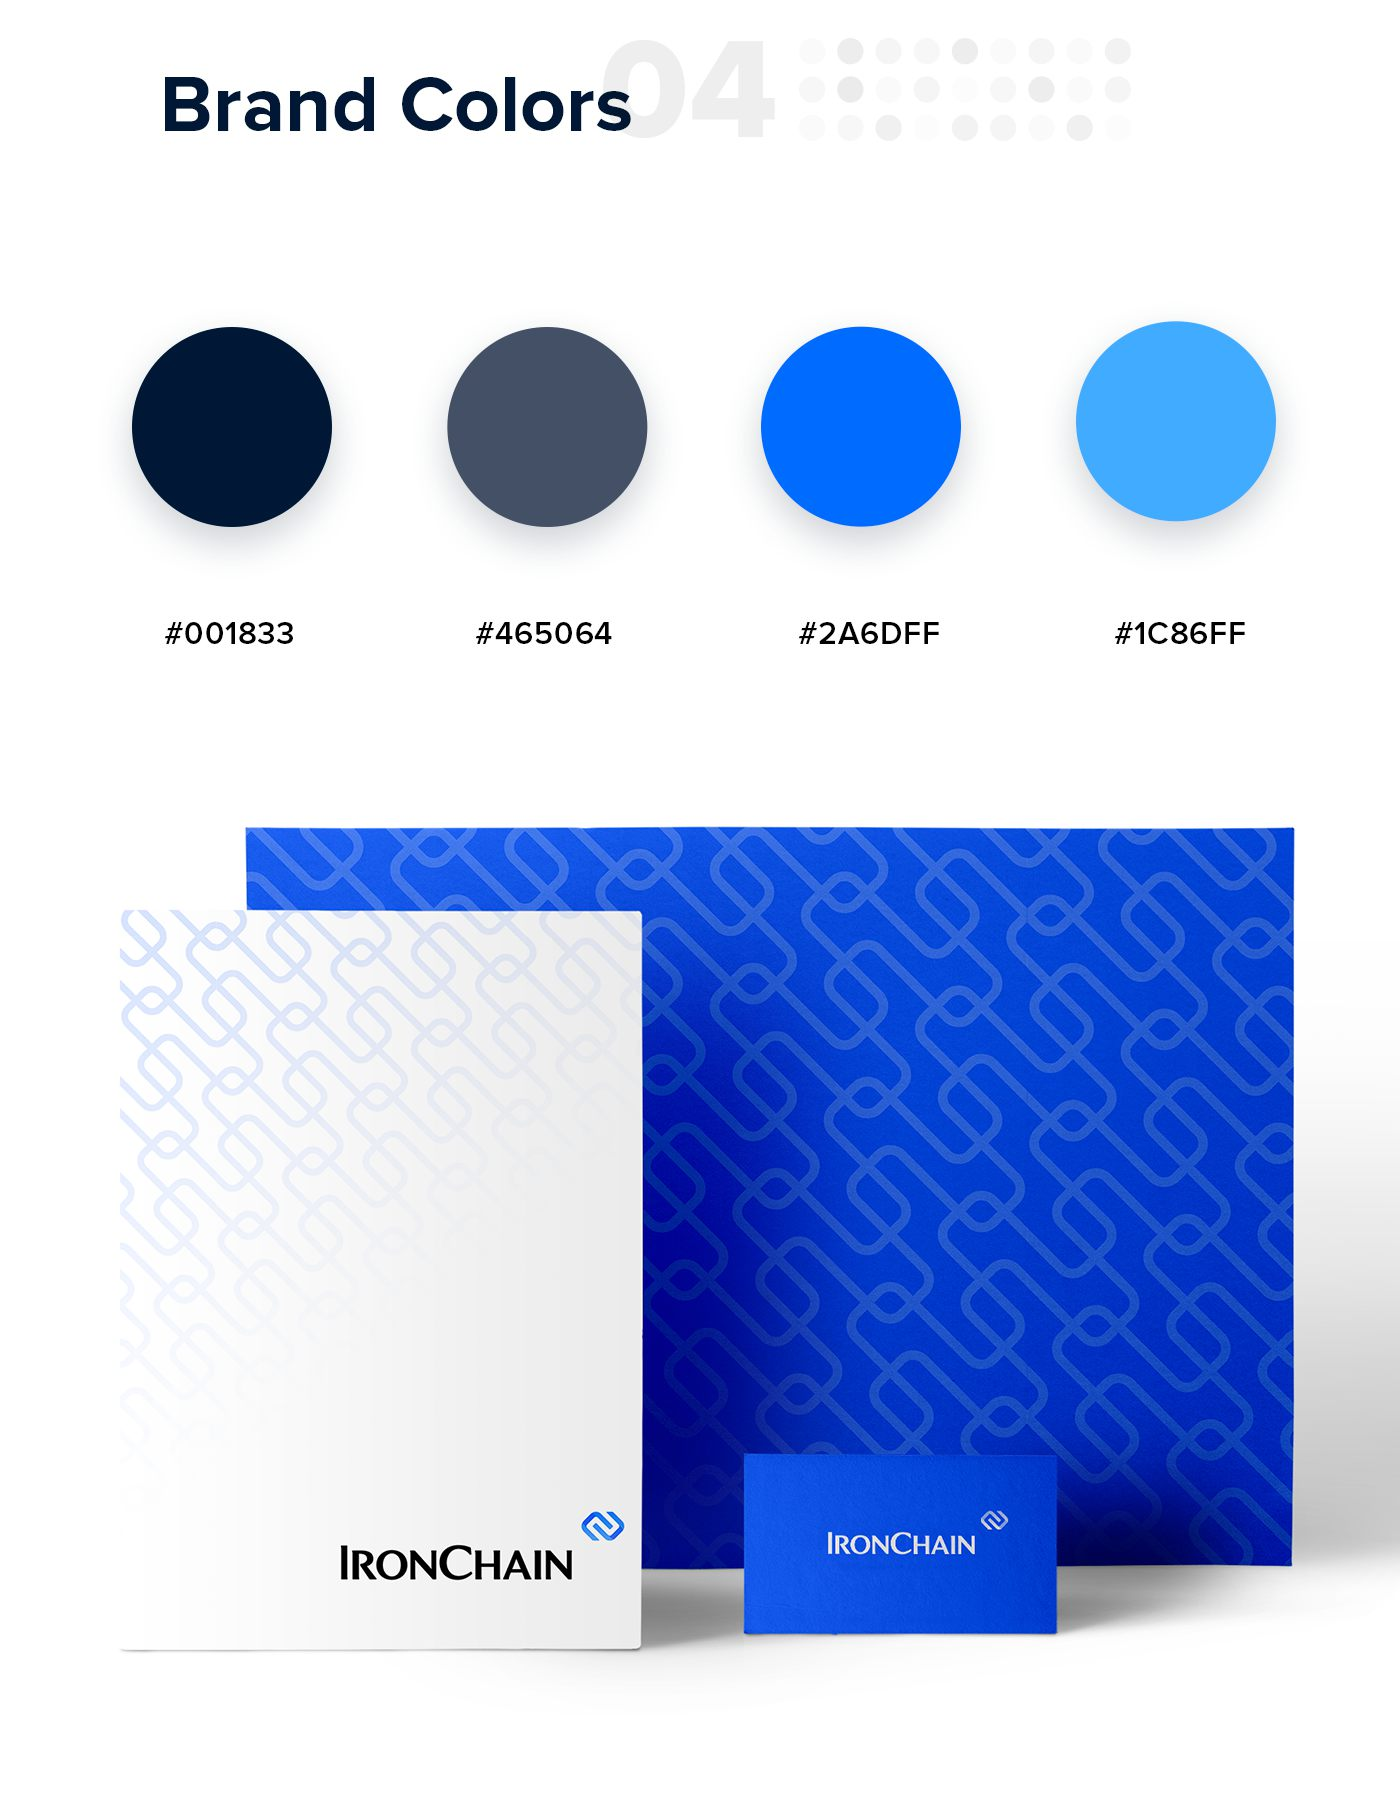 Ironchain Brand Colors